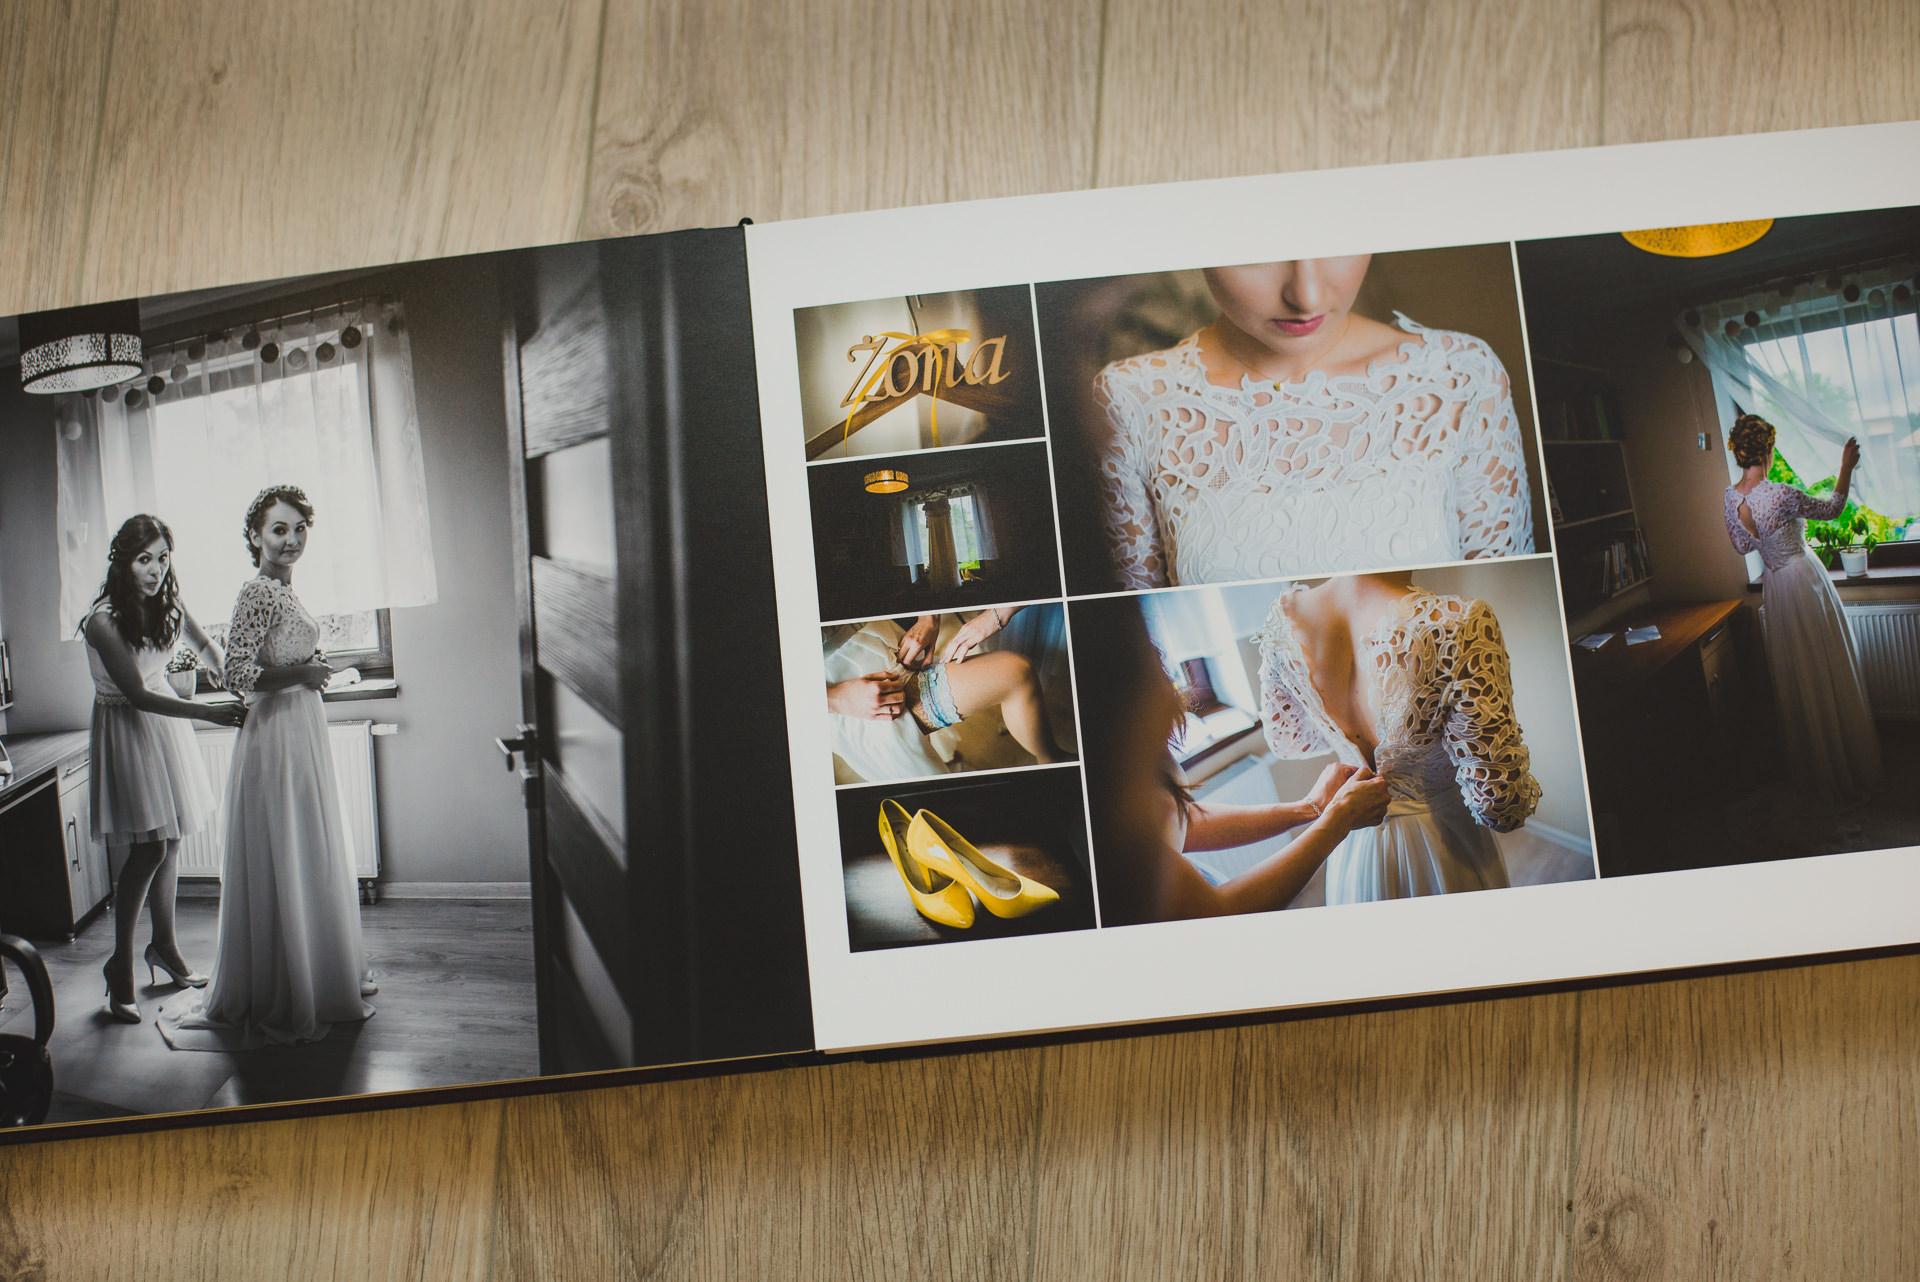 0010-Fotoalbumy-Produkty-2019-219_6079.JPG